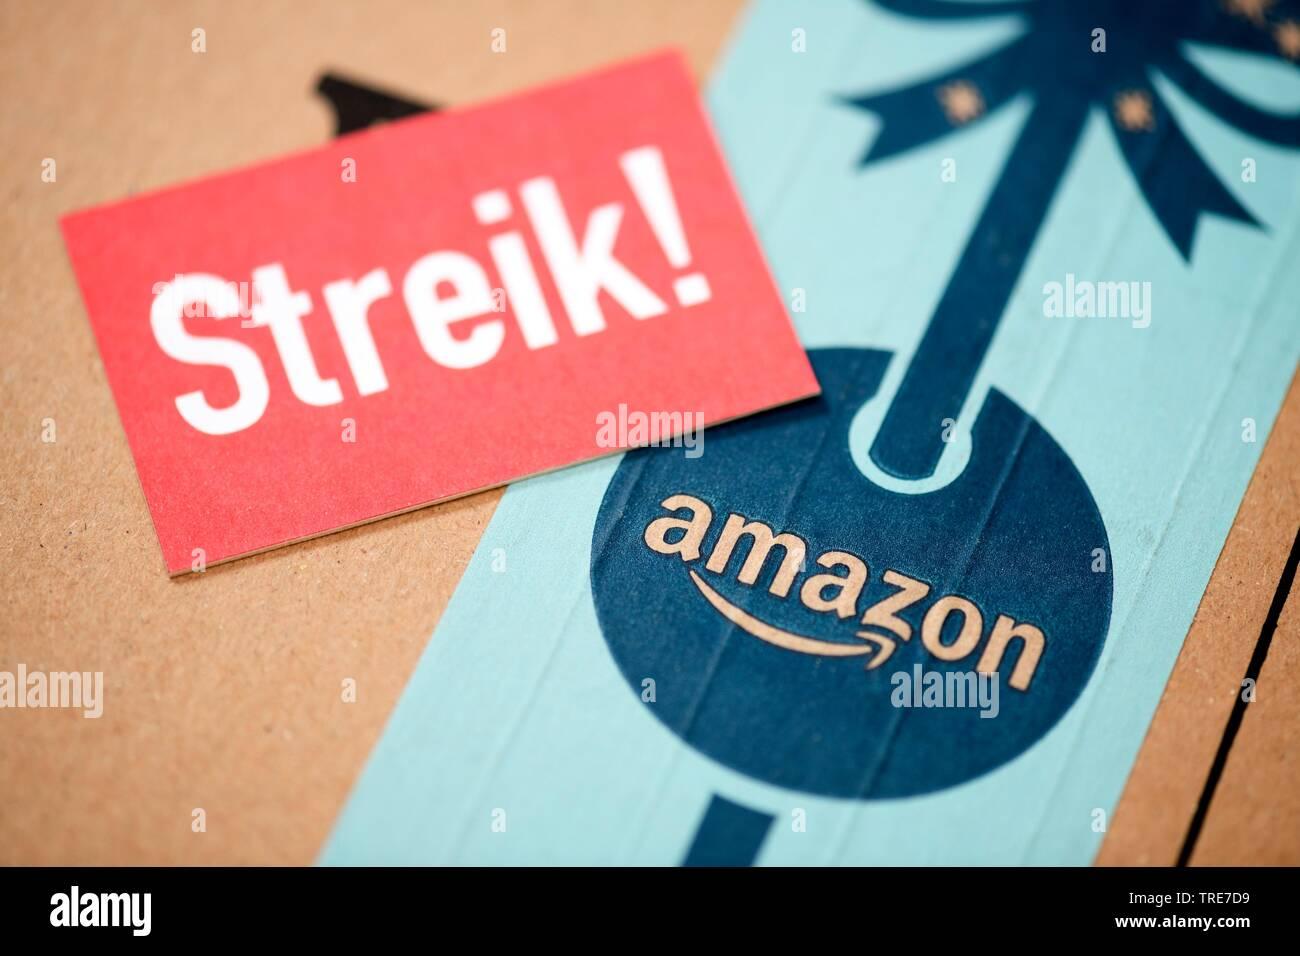 Streik bei Amazon, Deutschland | walkout at amazon, Germany | BLWS519209.jpg [ (c) blickwinkel/McPHOTO/C. Ohde Tel. +49 (0)2302-2793220, E-mail: info@ - Stock Image